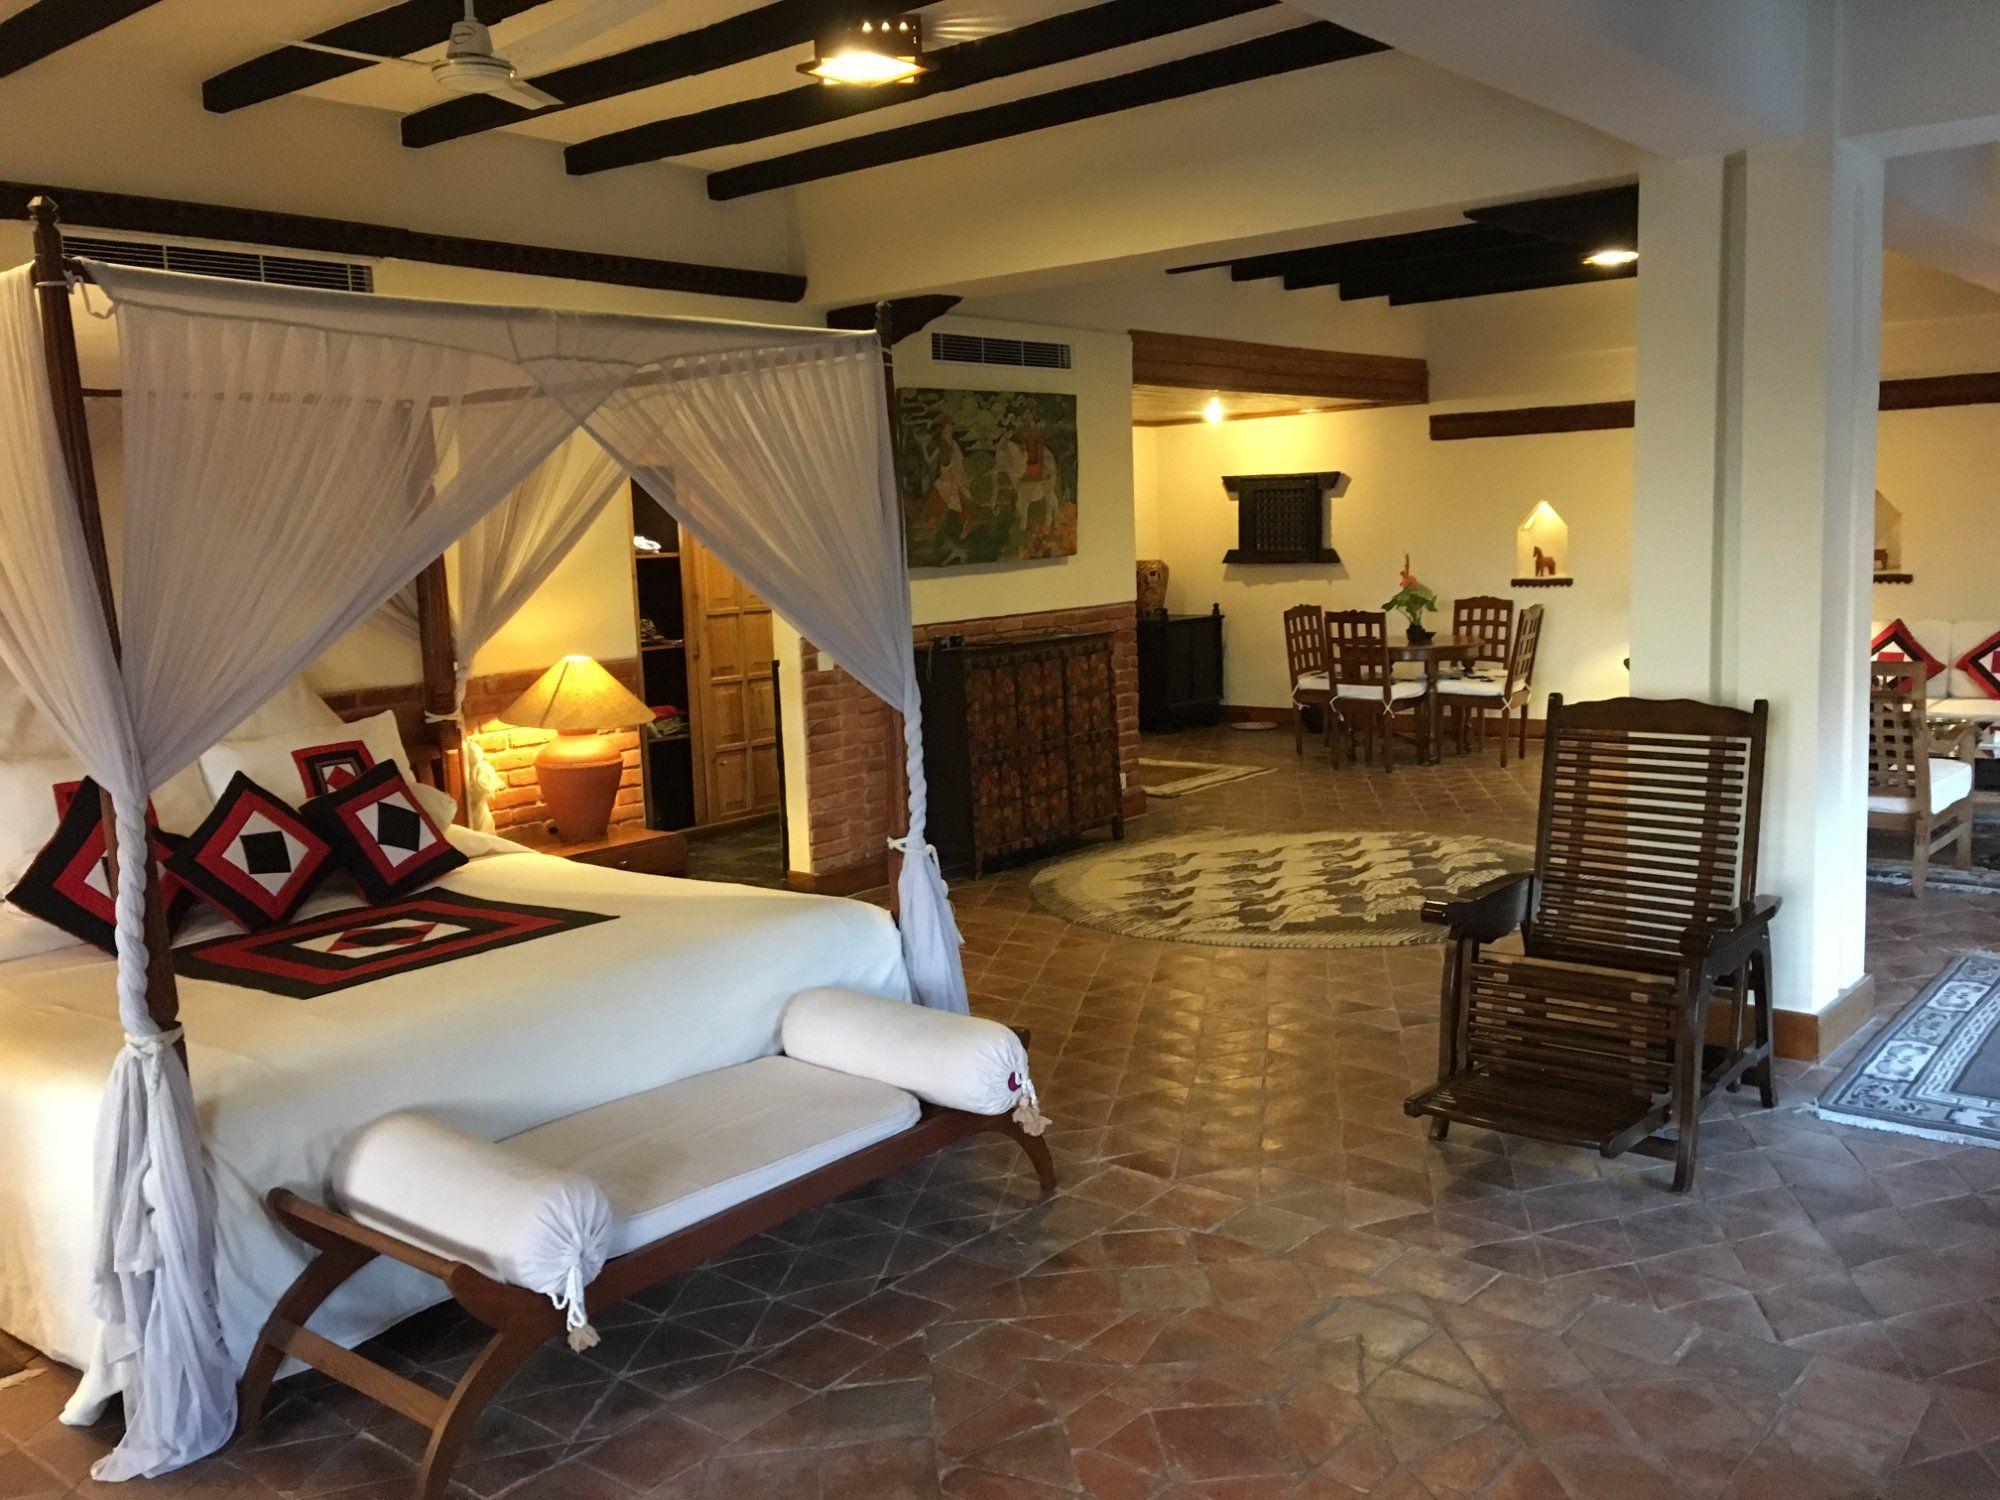 Dwarika's Hotel Hotel, Kathmandu, Central region